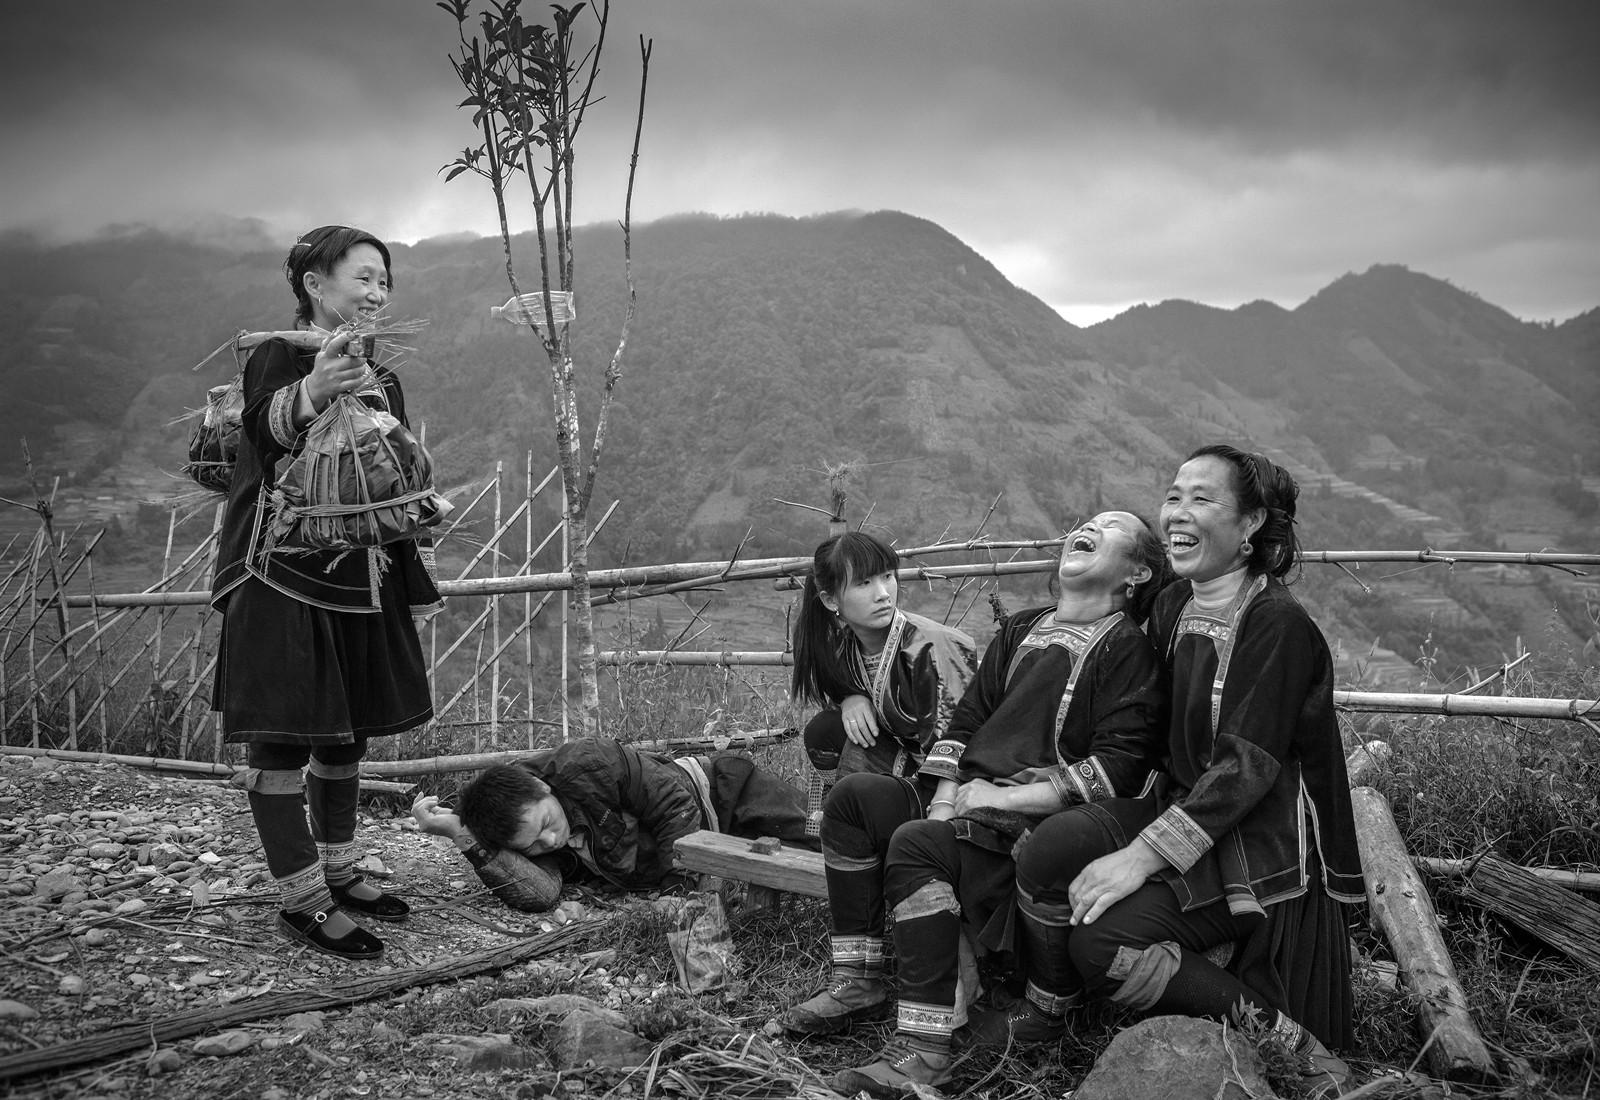 kuang-huimin-ancient-kam-rice-of-millennium-photography-of-china-(23).jpg